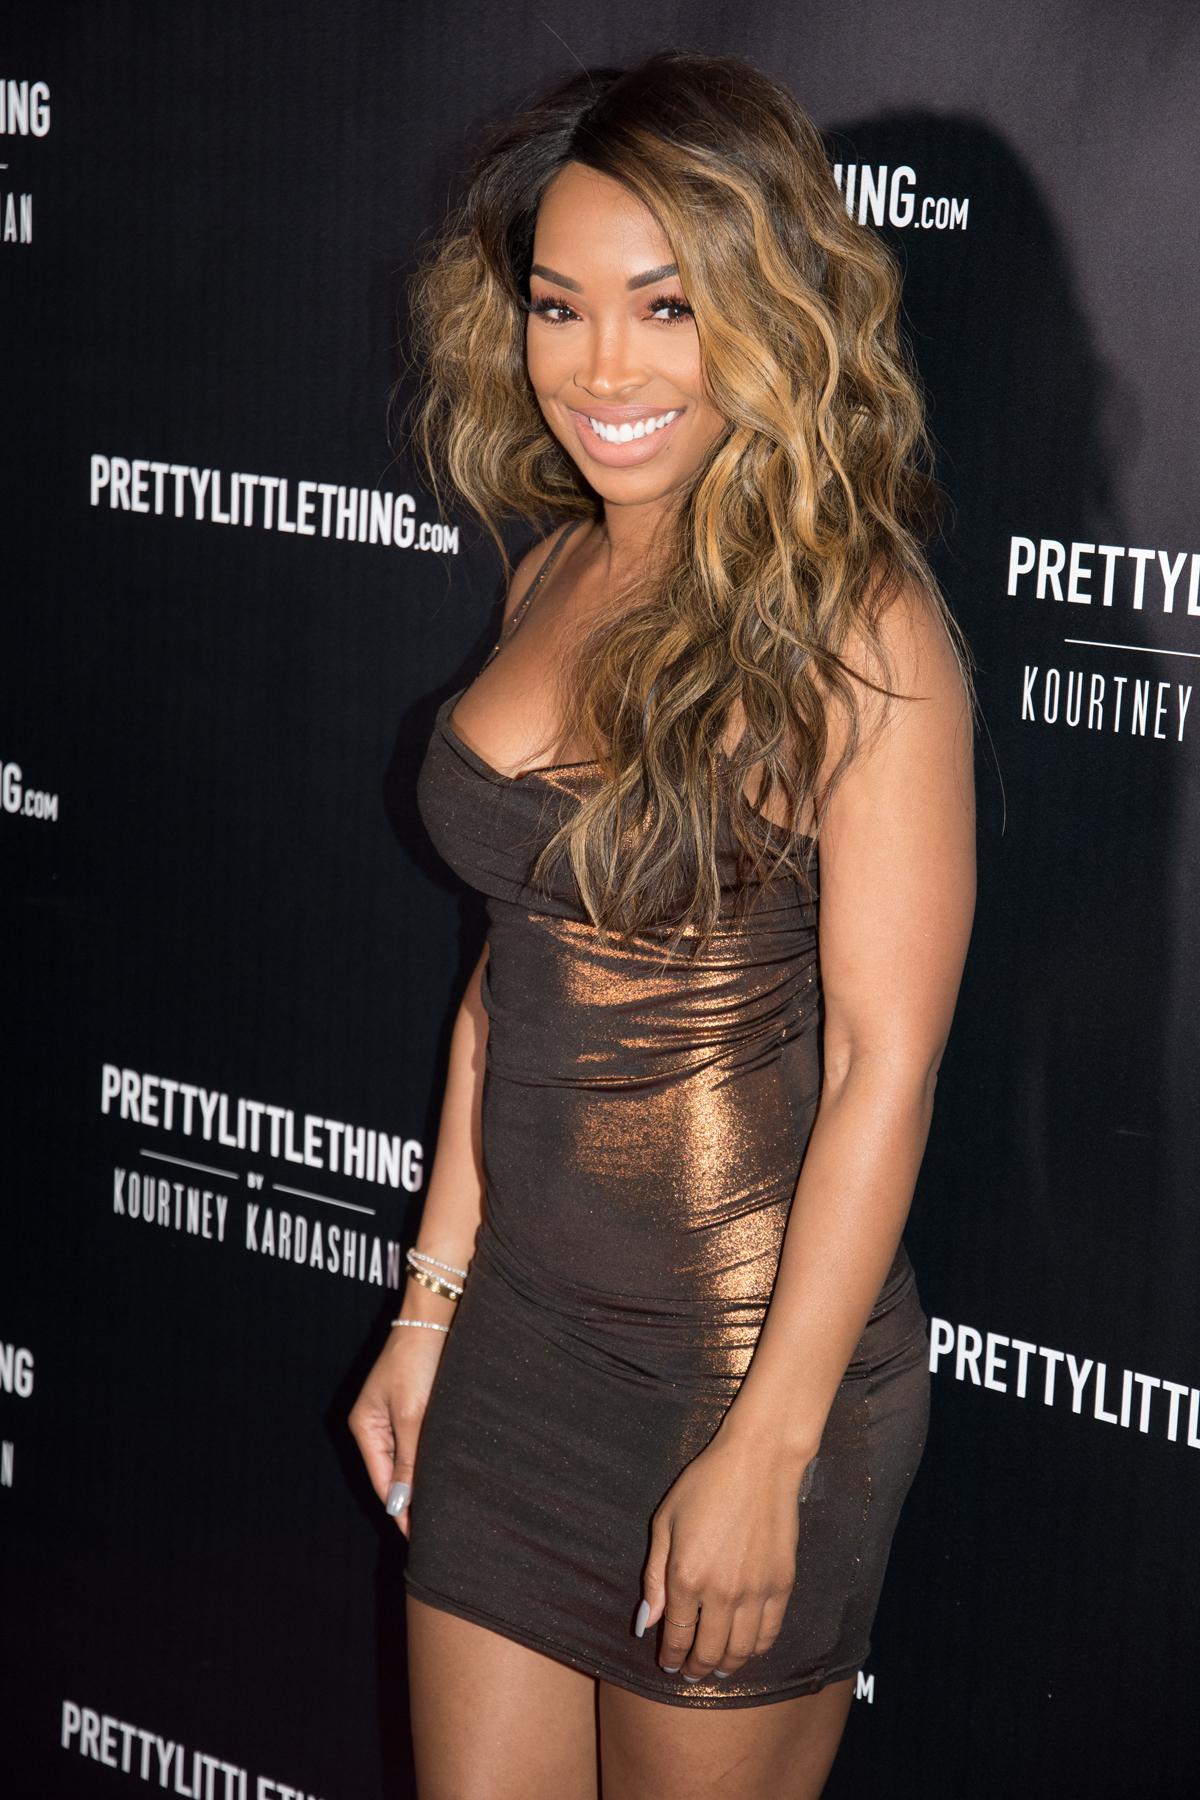 PrettyLittleThing PLT X Kourtney Kardashian Collection Celebrity Launch Party malika haqq.jpg